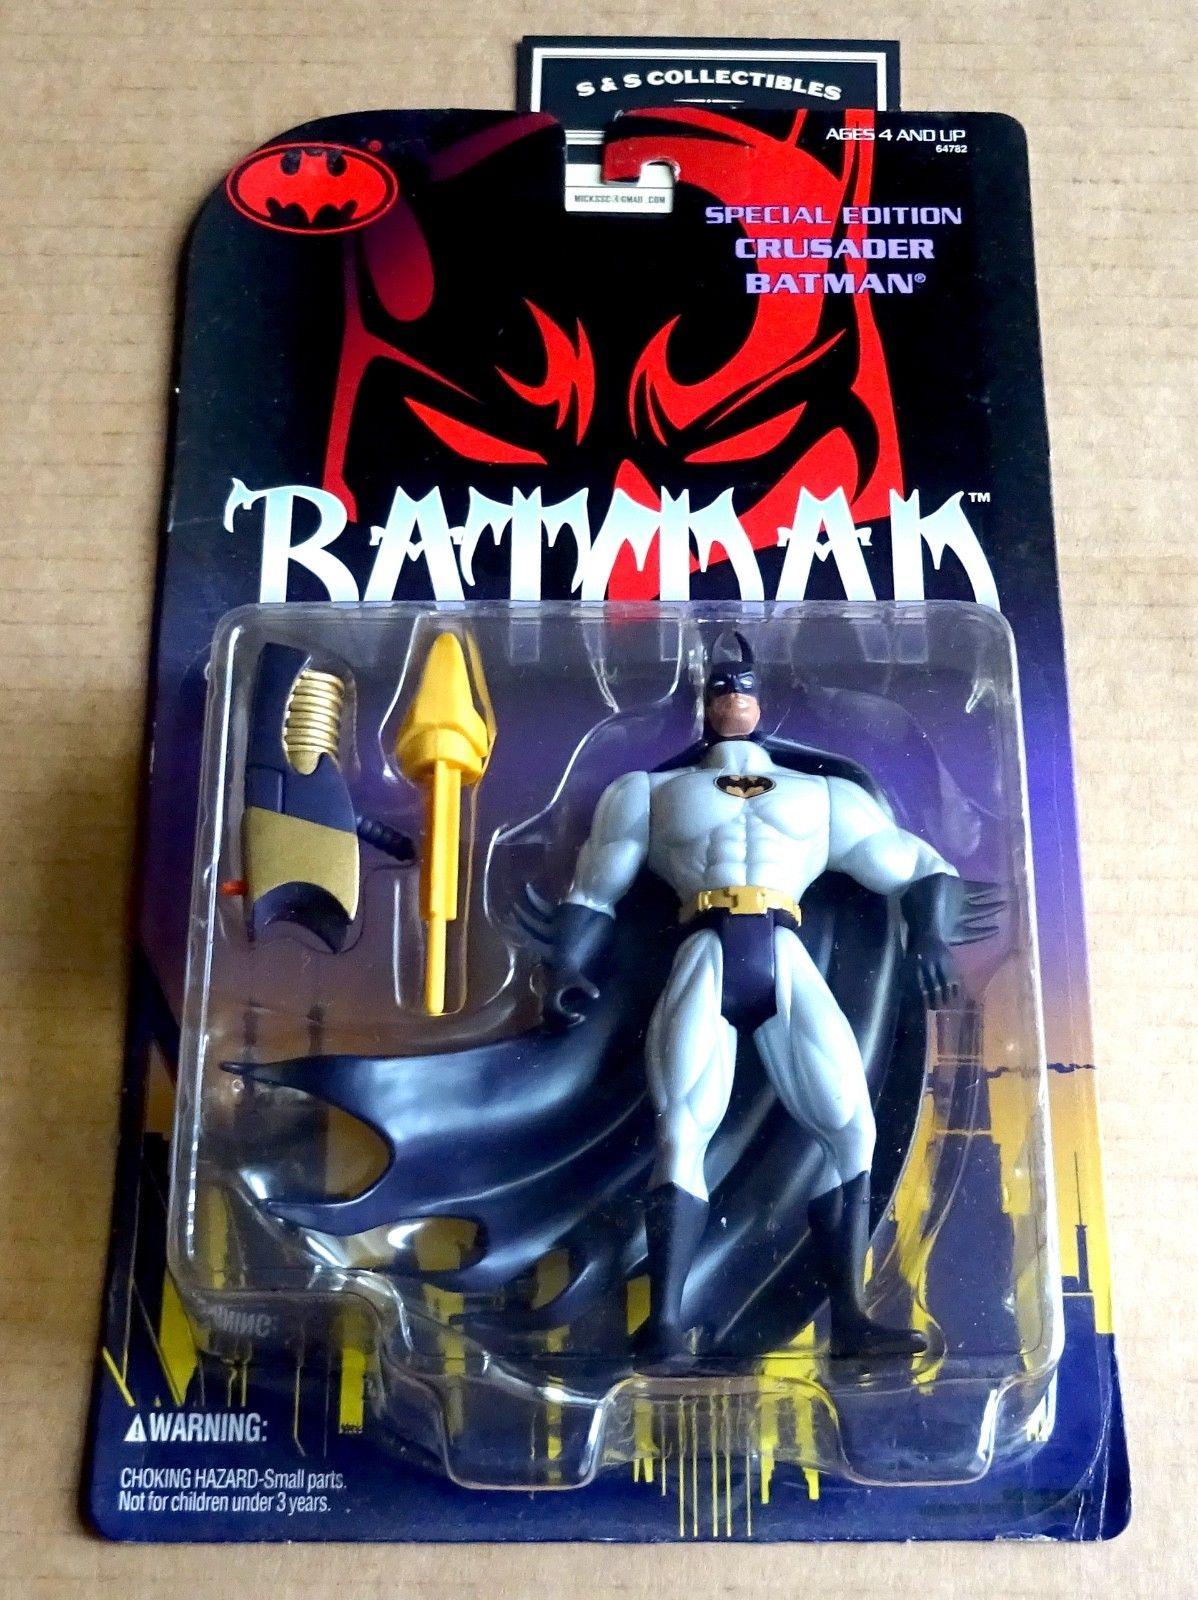 crusader_batman.jpg